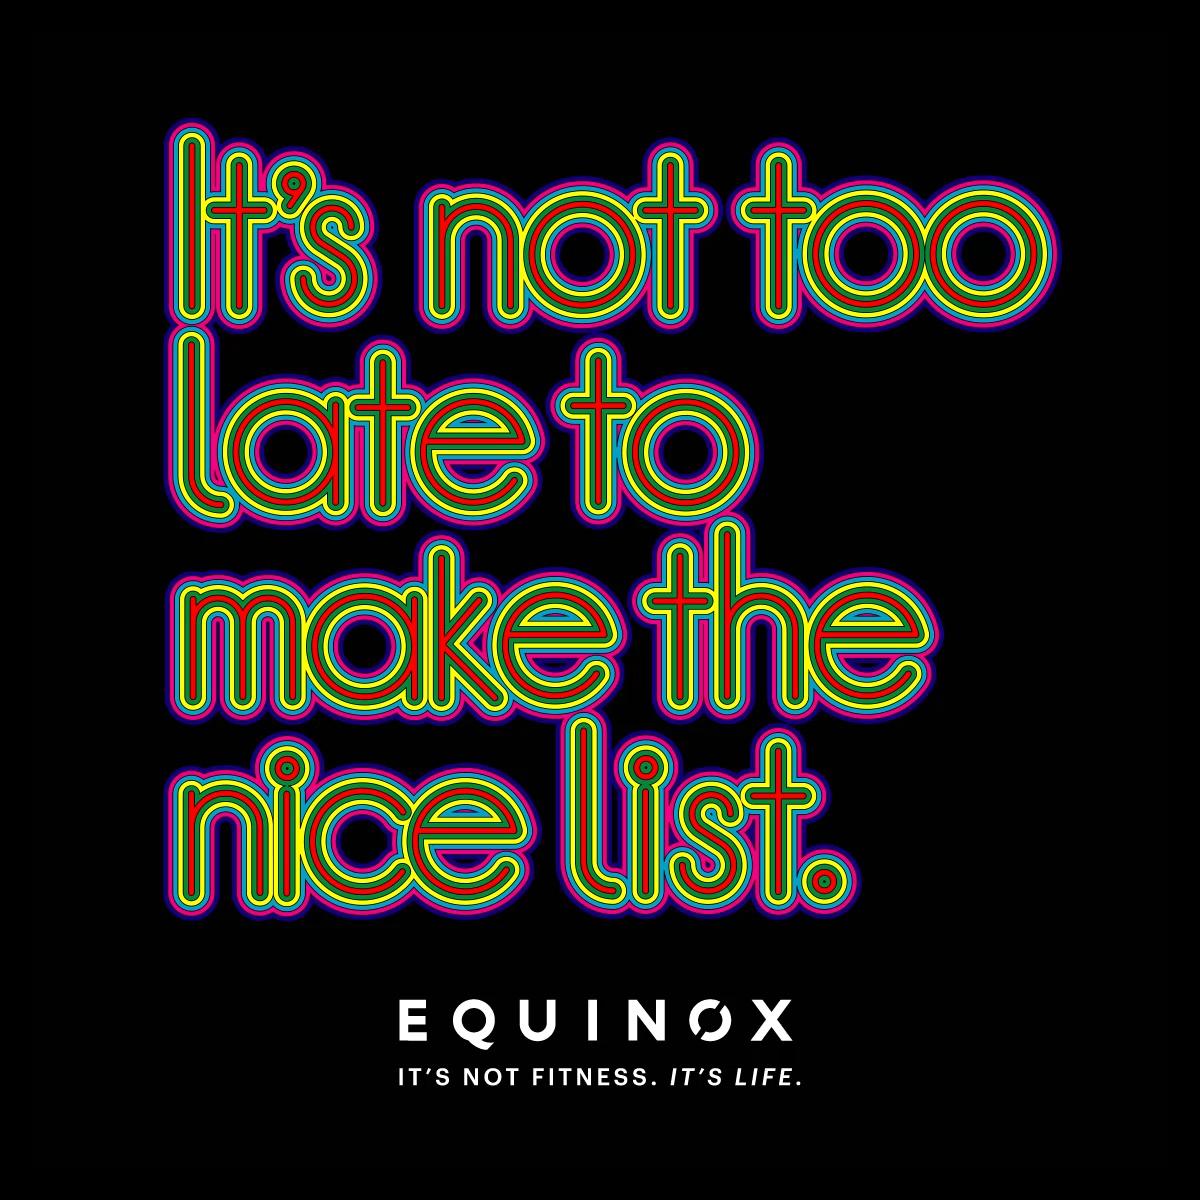 Equinox Gym animated quote